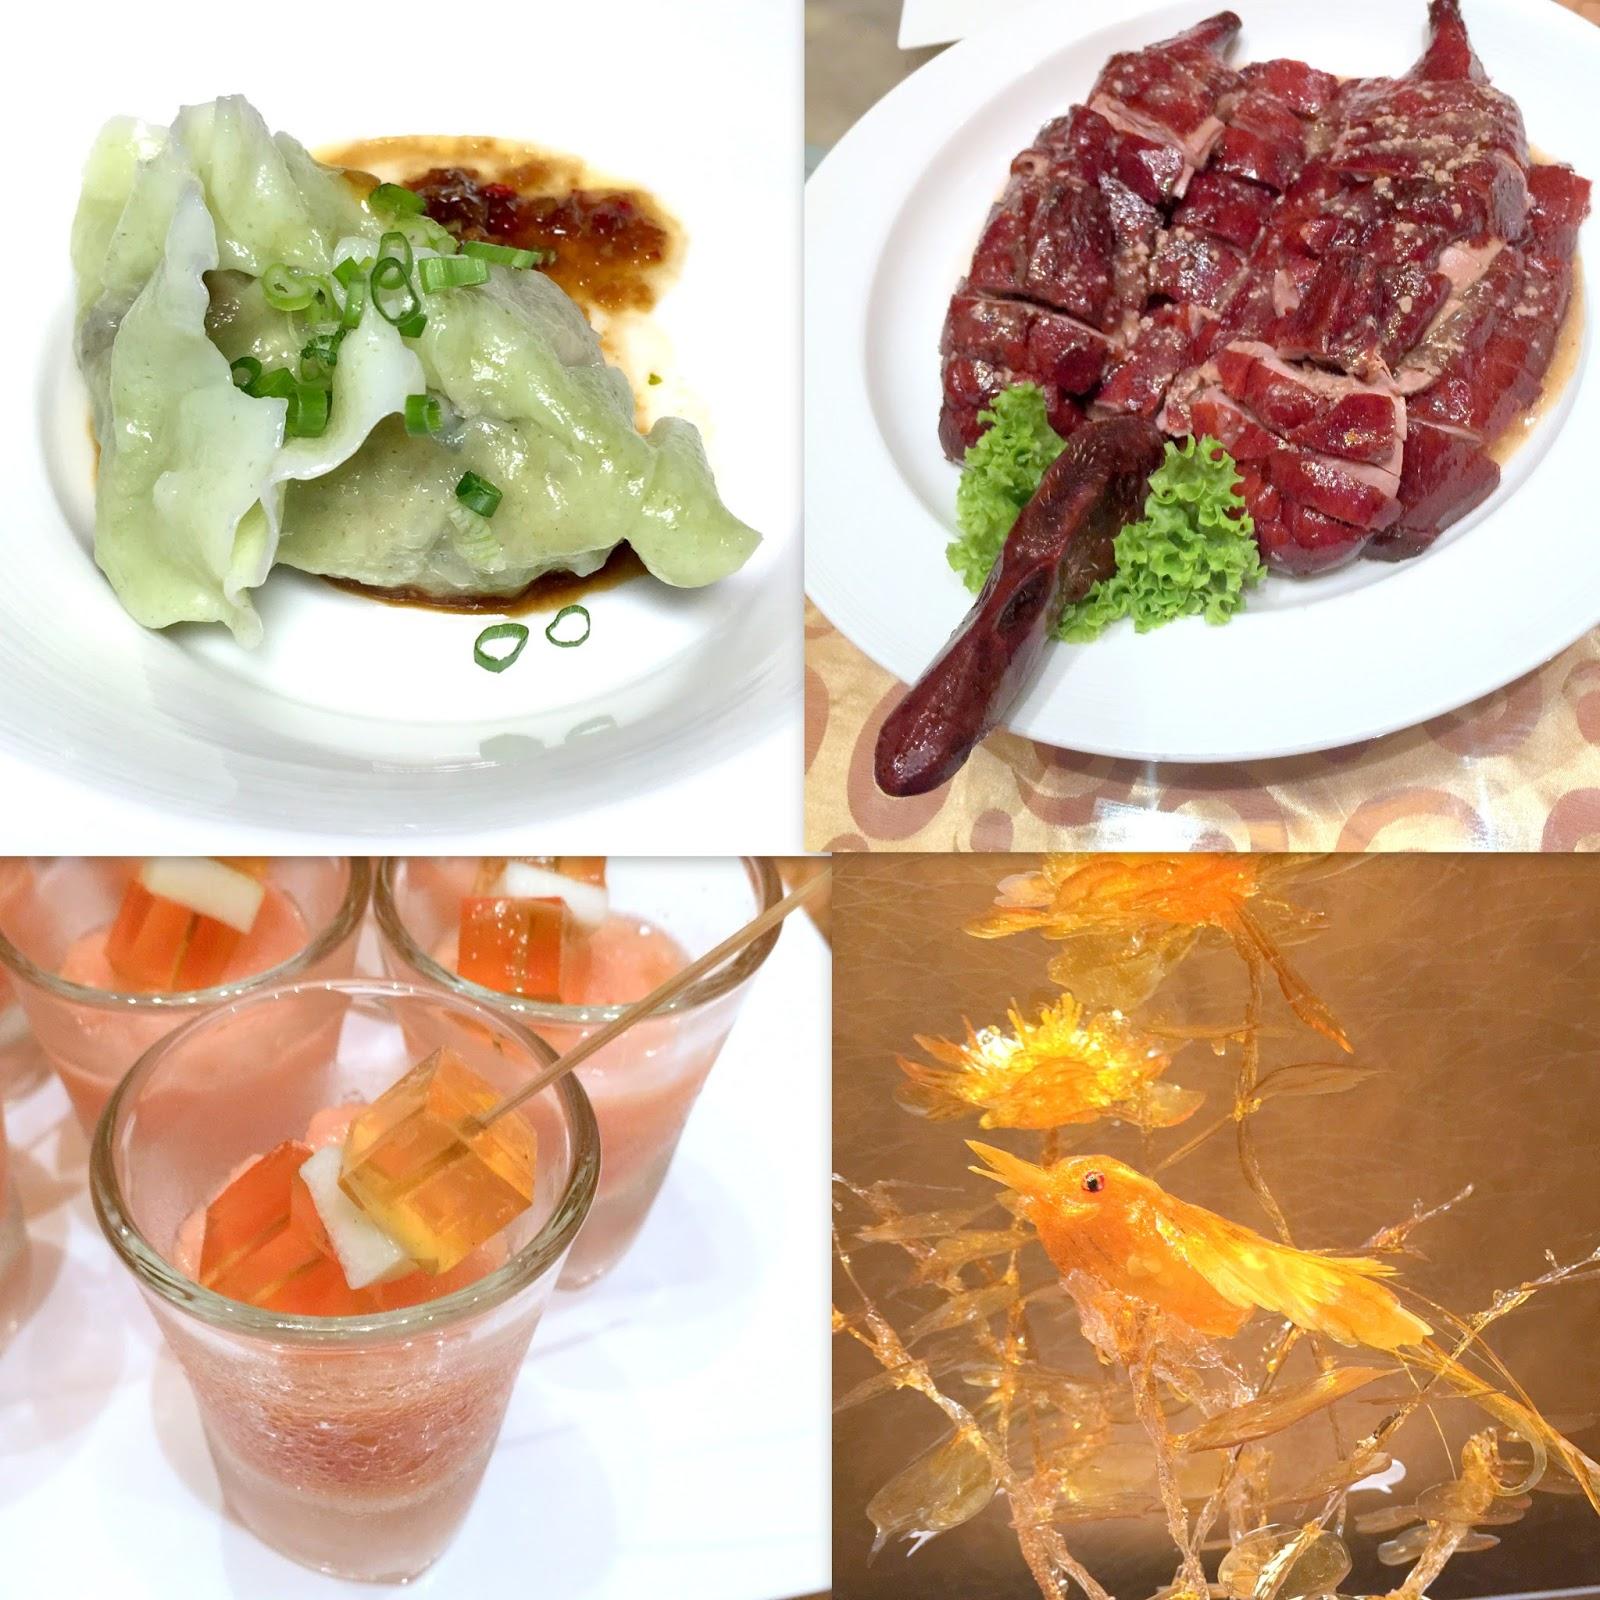 Singapore Japan Food Blog : Dairy and Cream: Jade Restaurant @ The Fullerton Hotel: Chinese New ...